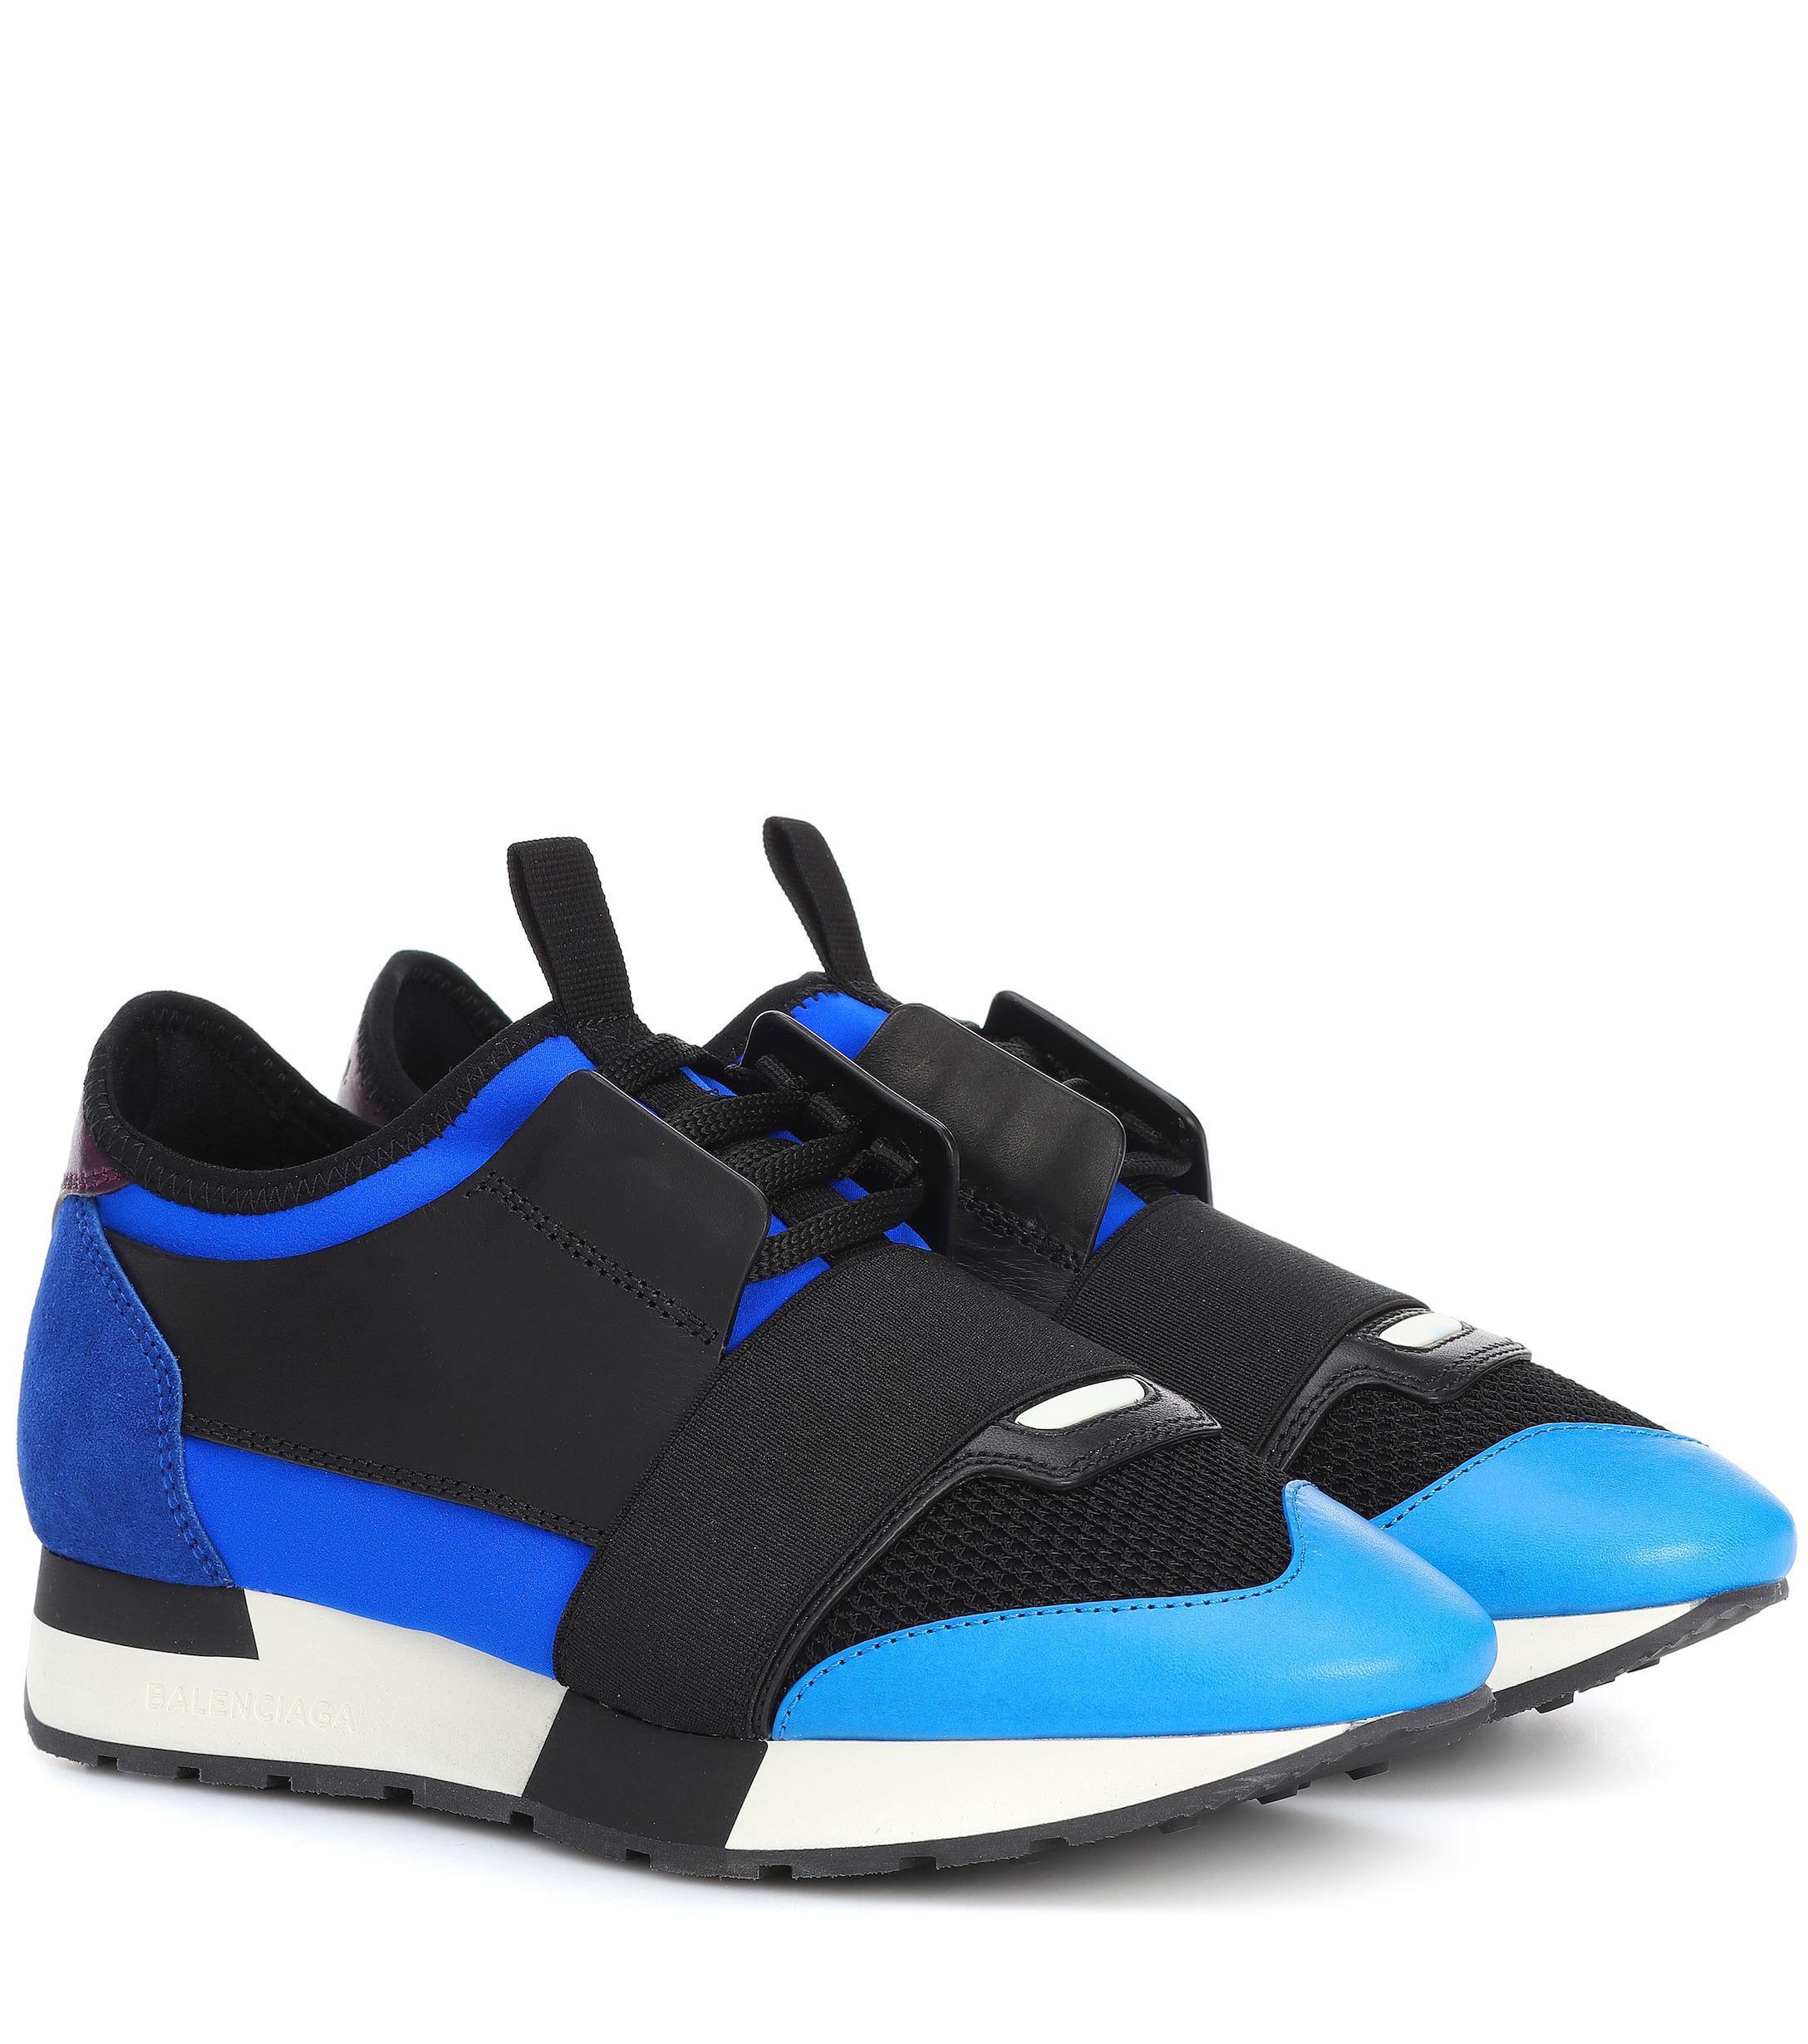 deacea685b14e Lyst - Balenciaga Race Runner Sneakers in Blue - Save 50%